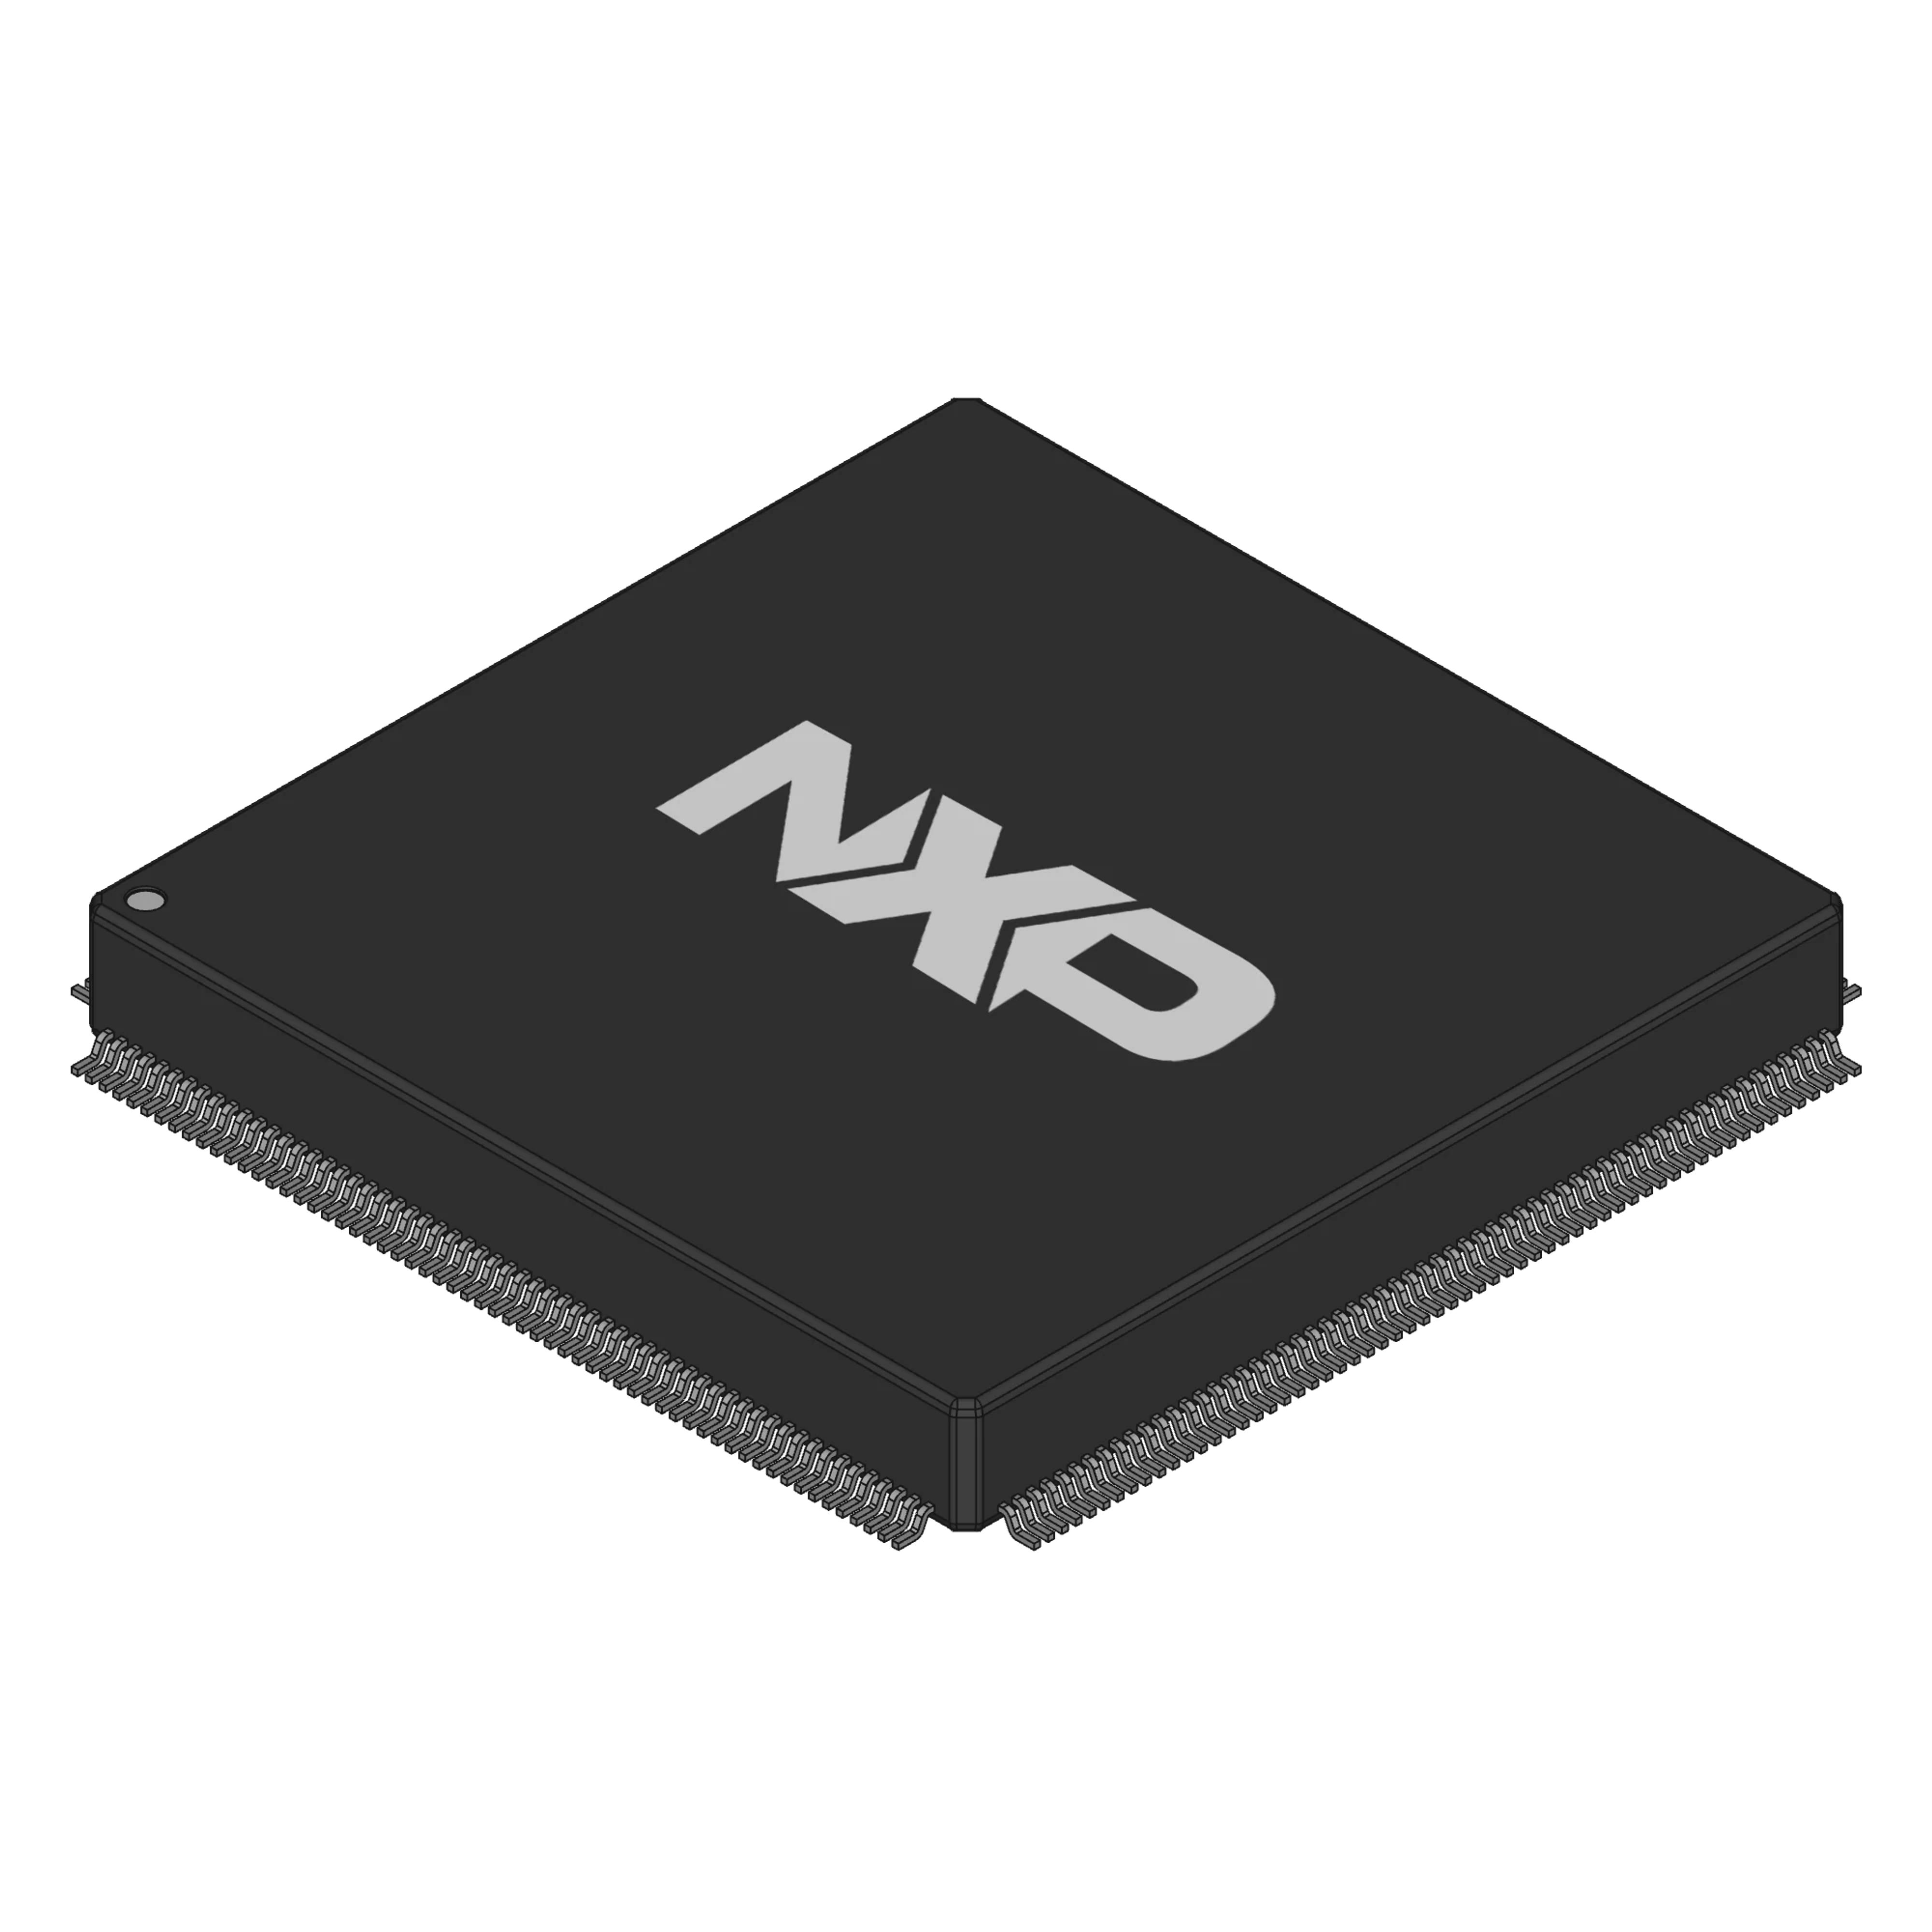 NXP_MC68EN360_logoadded